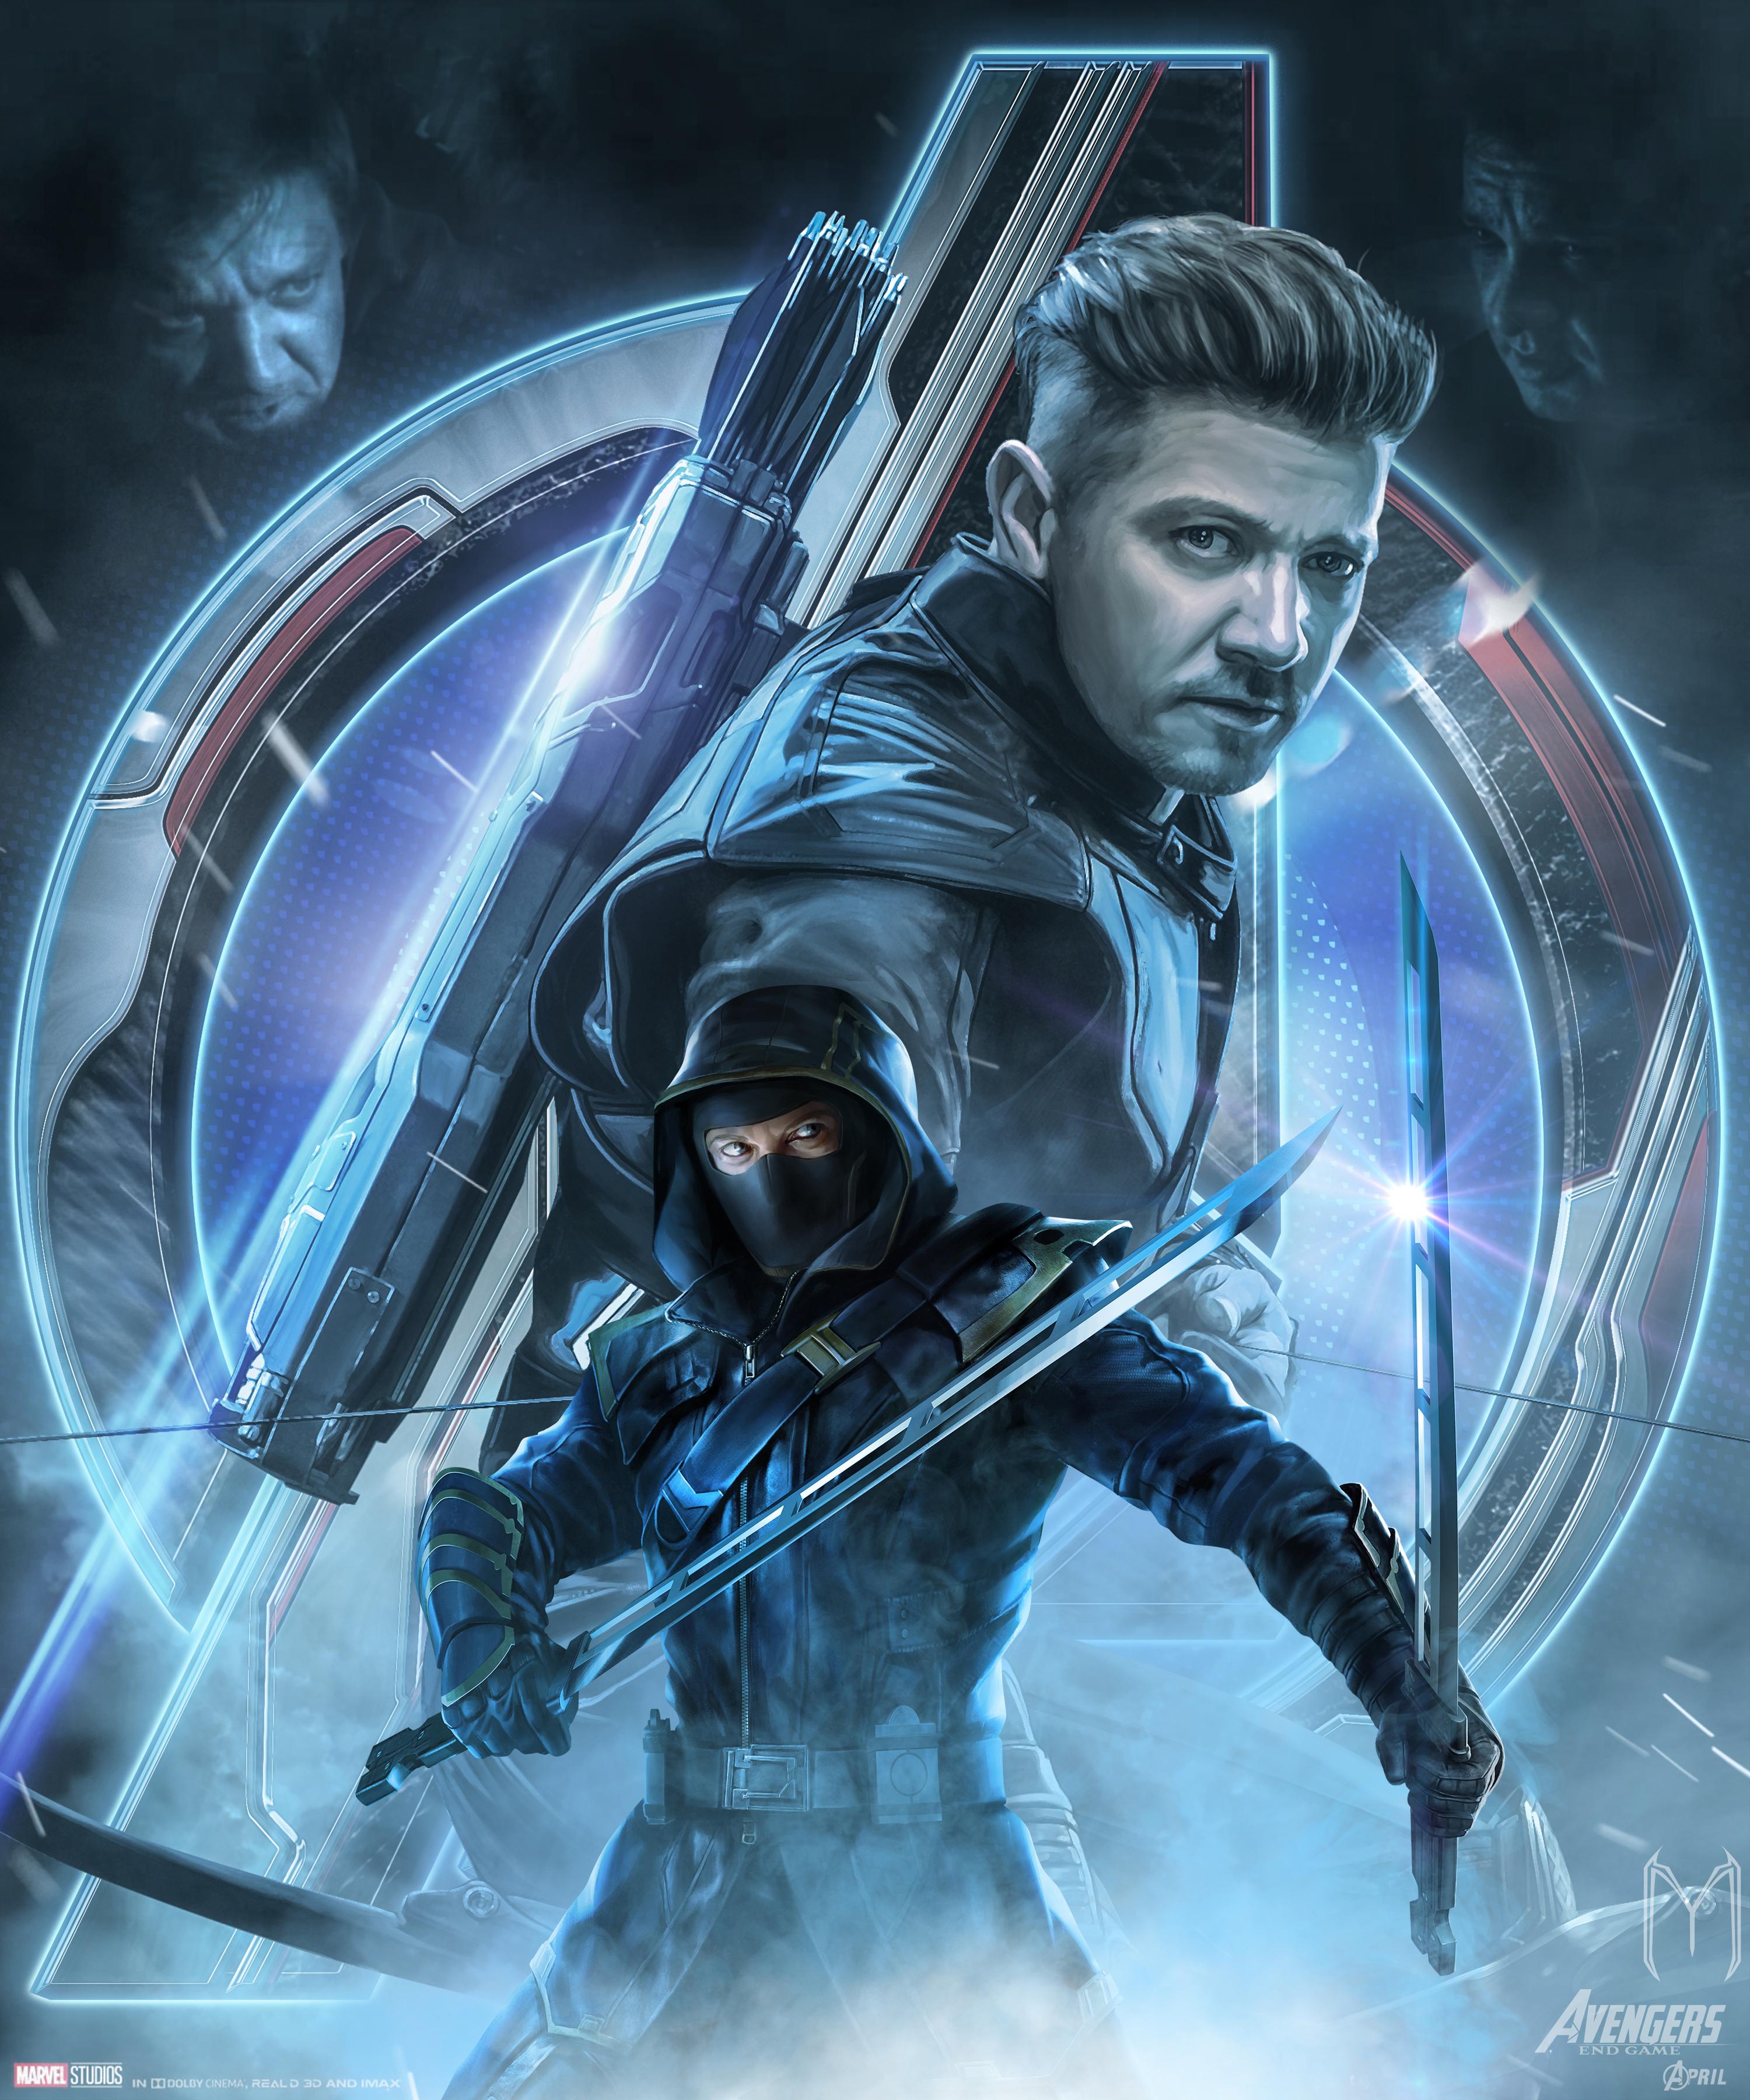 Avengers Endgame Ronin Hawkeye Poster Key Art Wallpaper HD Movies 3000x3600